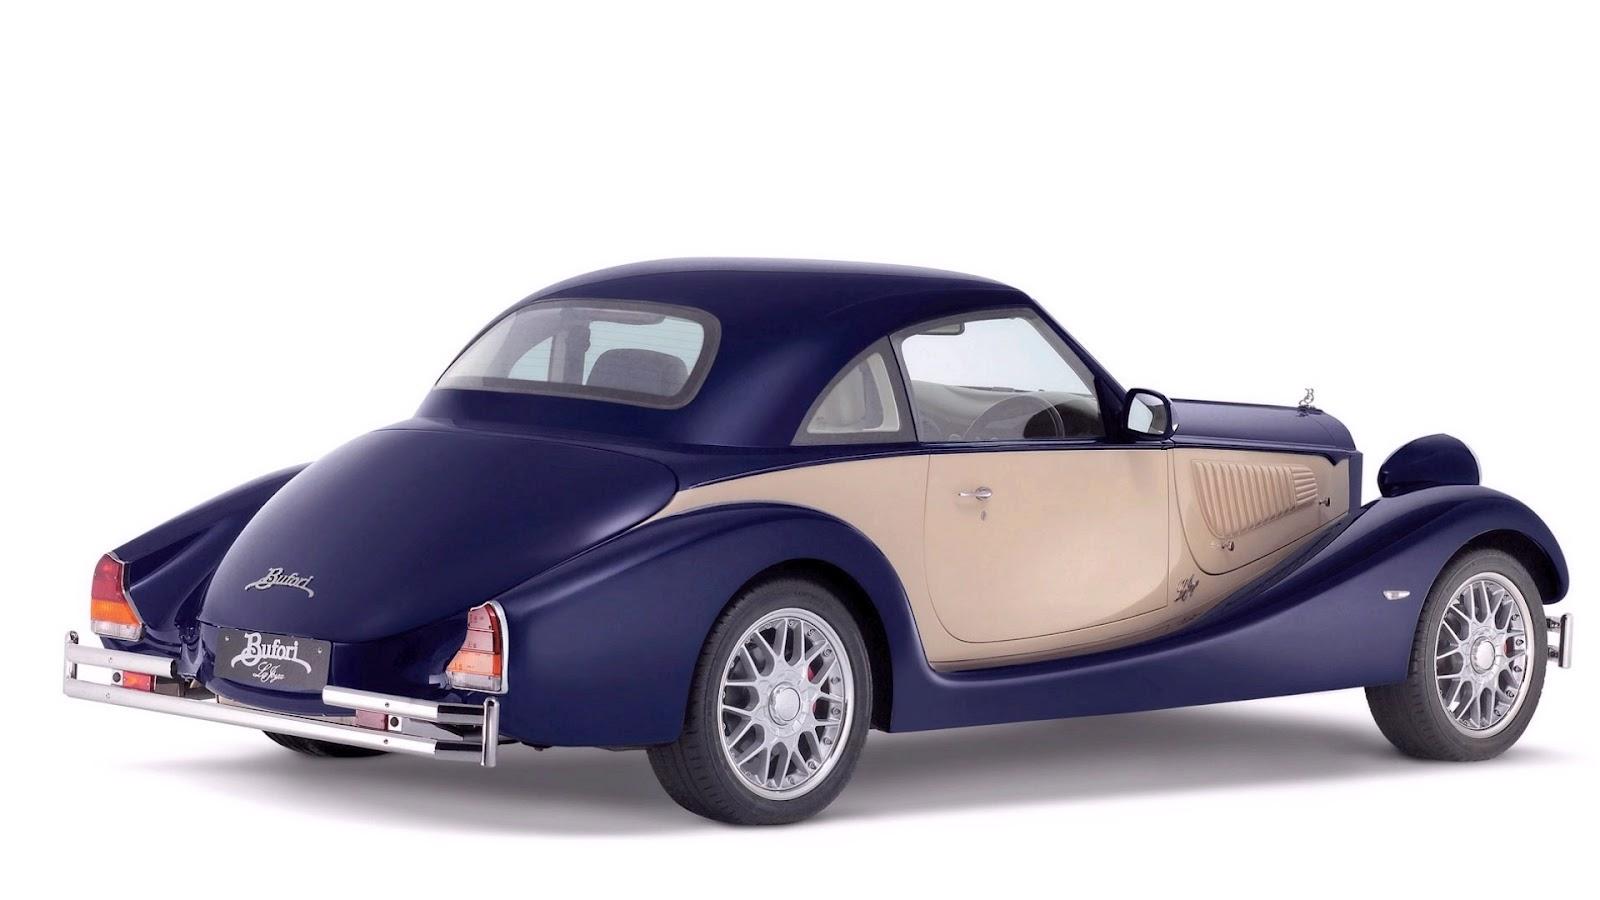 Claret and silver color vintage car